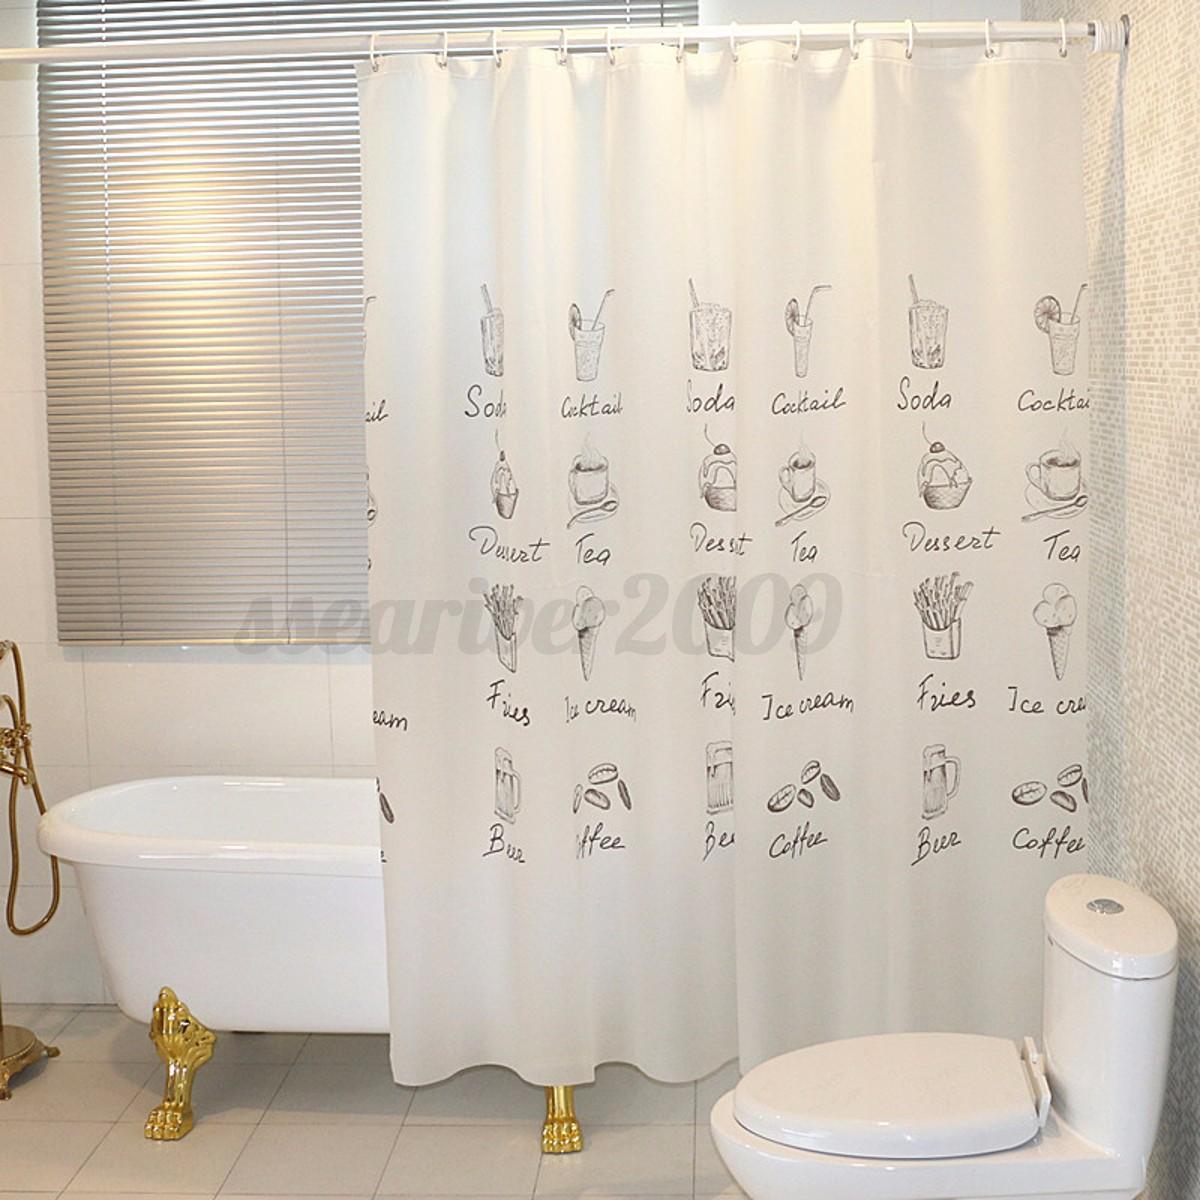 1 8m fabric waterproof bathroom shower curtain panel sheer decor with hooks set. Black Bedroom Furniture Sets. Home Design Ideas